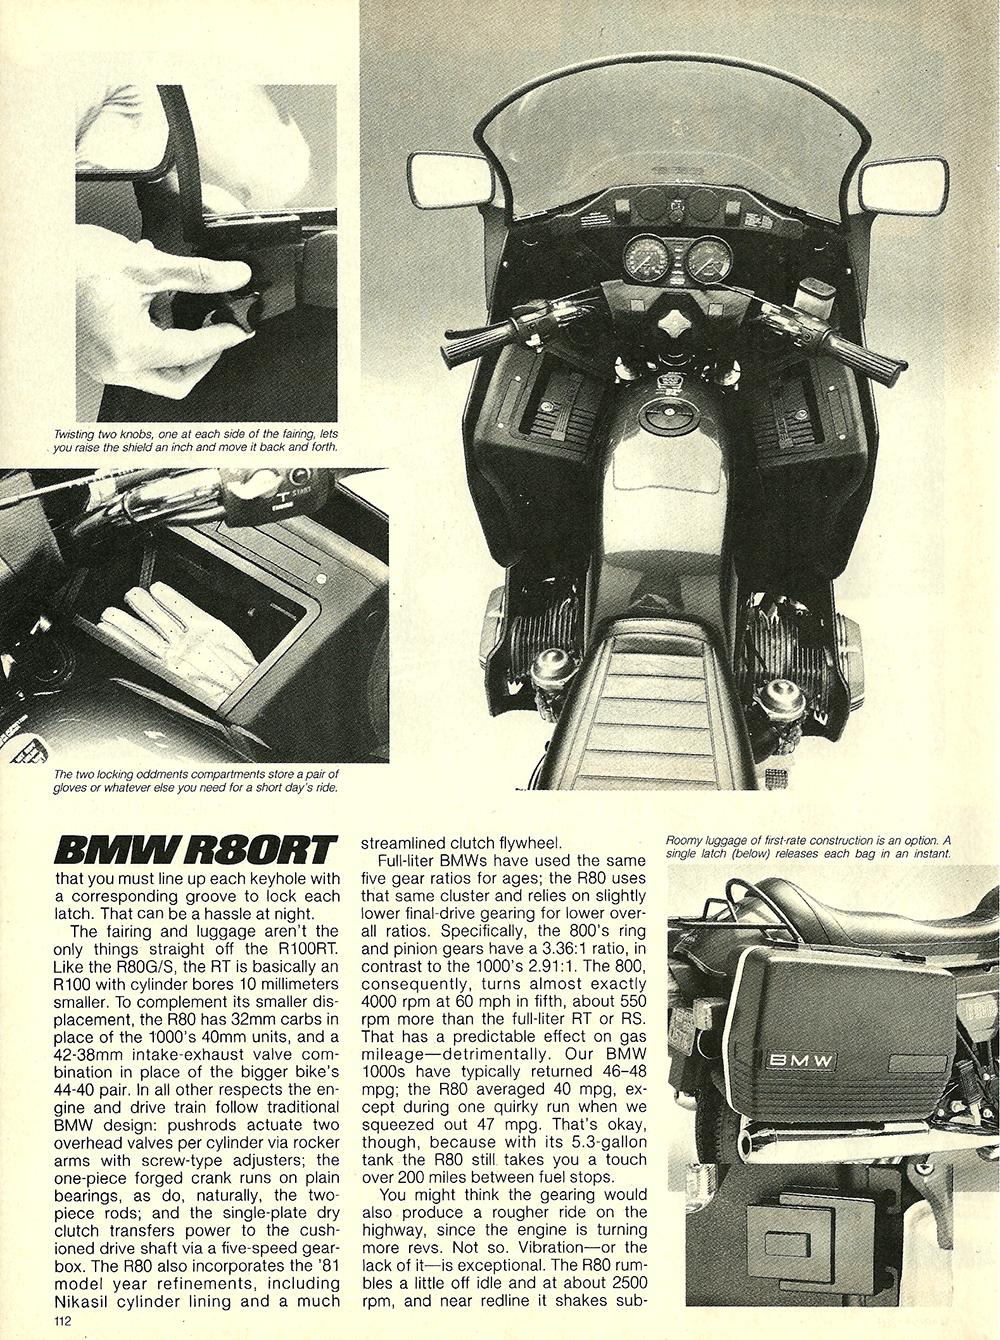 1983 BMW R80RT road test 5.jpg